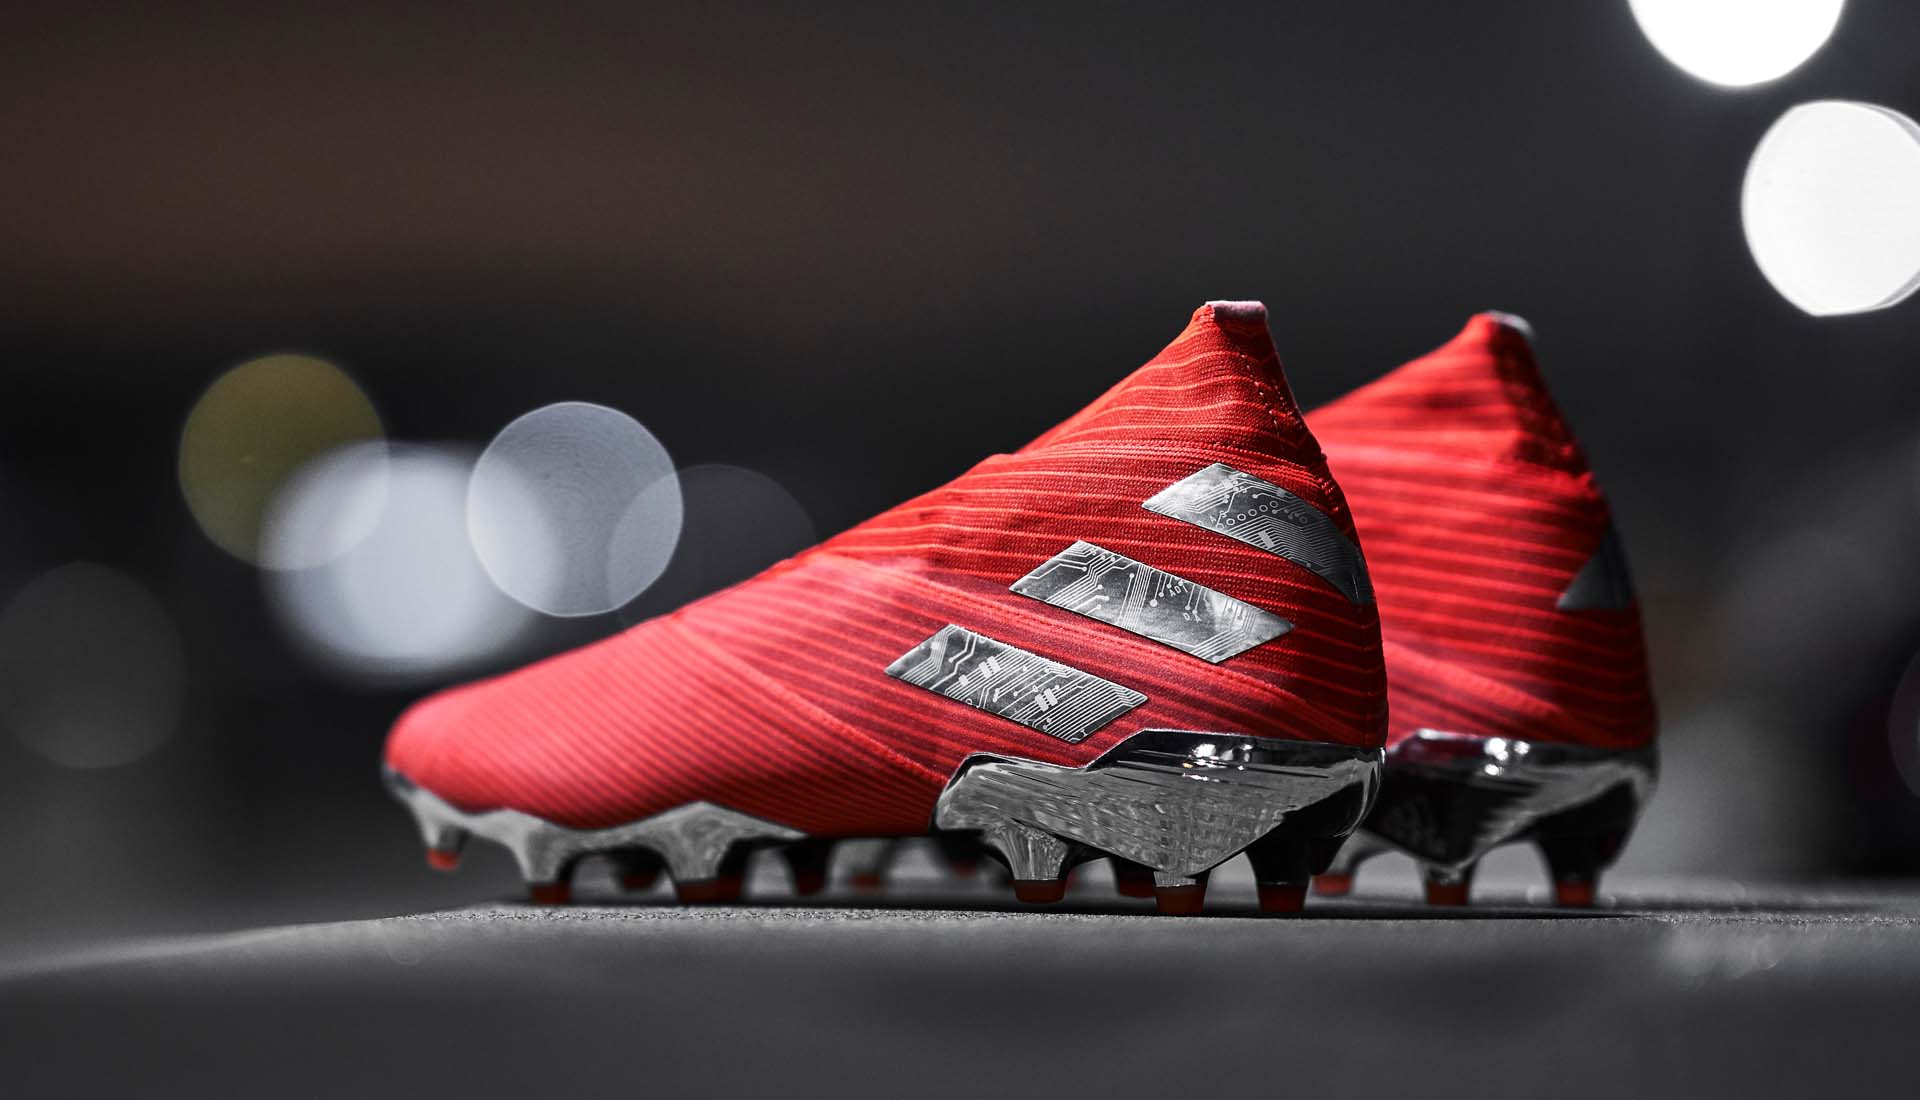 83279f1e8 adidas Launch The New-Generation Nemeziz 19+ - SoccerBible